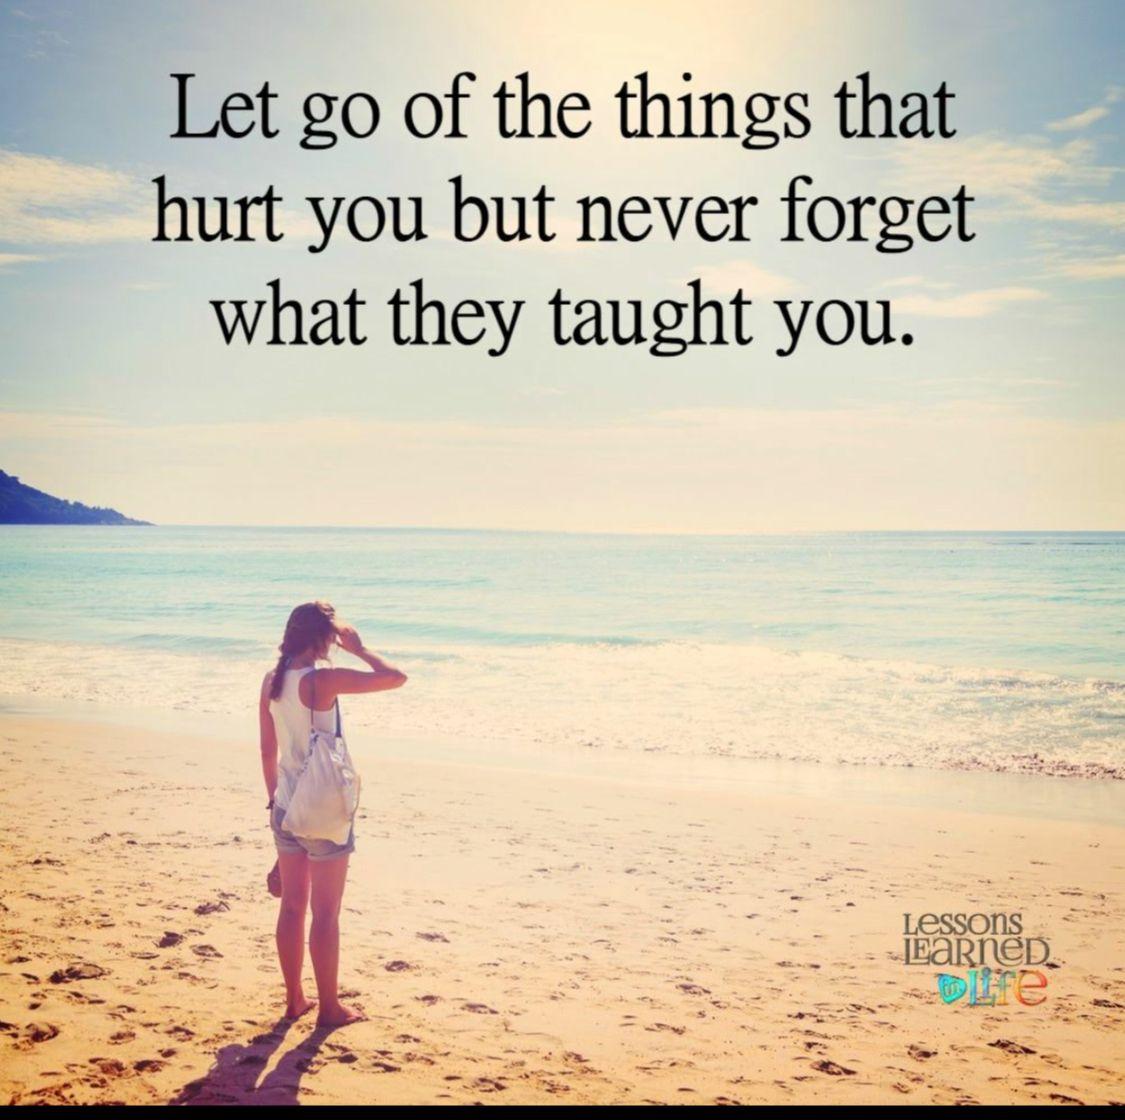 Wunderbar Zitaten Leben Beste Wahl Let Go